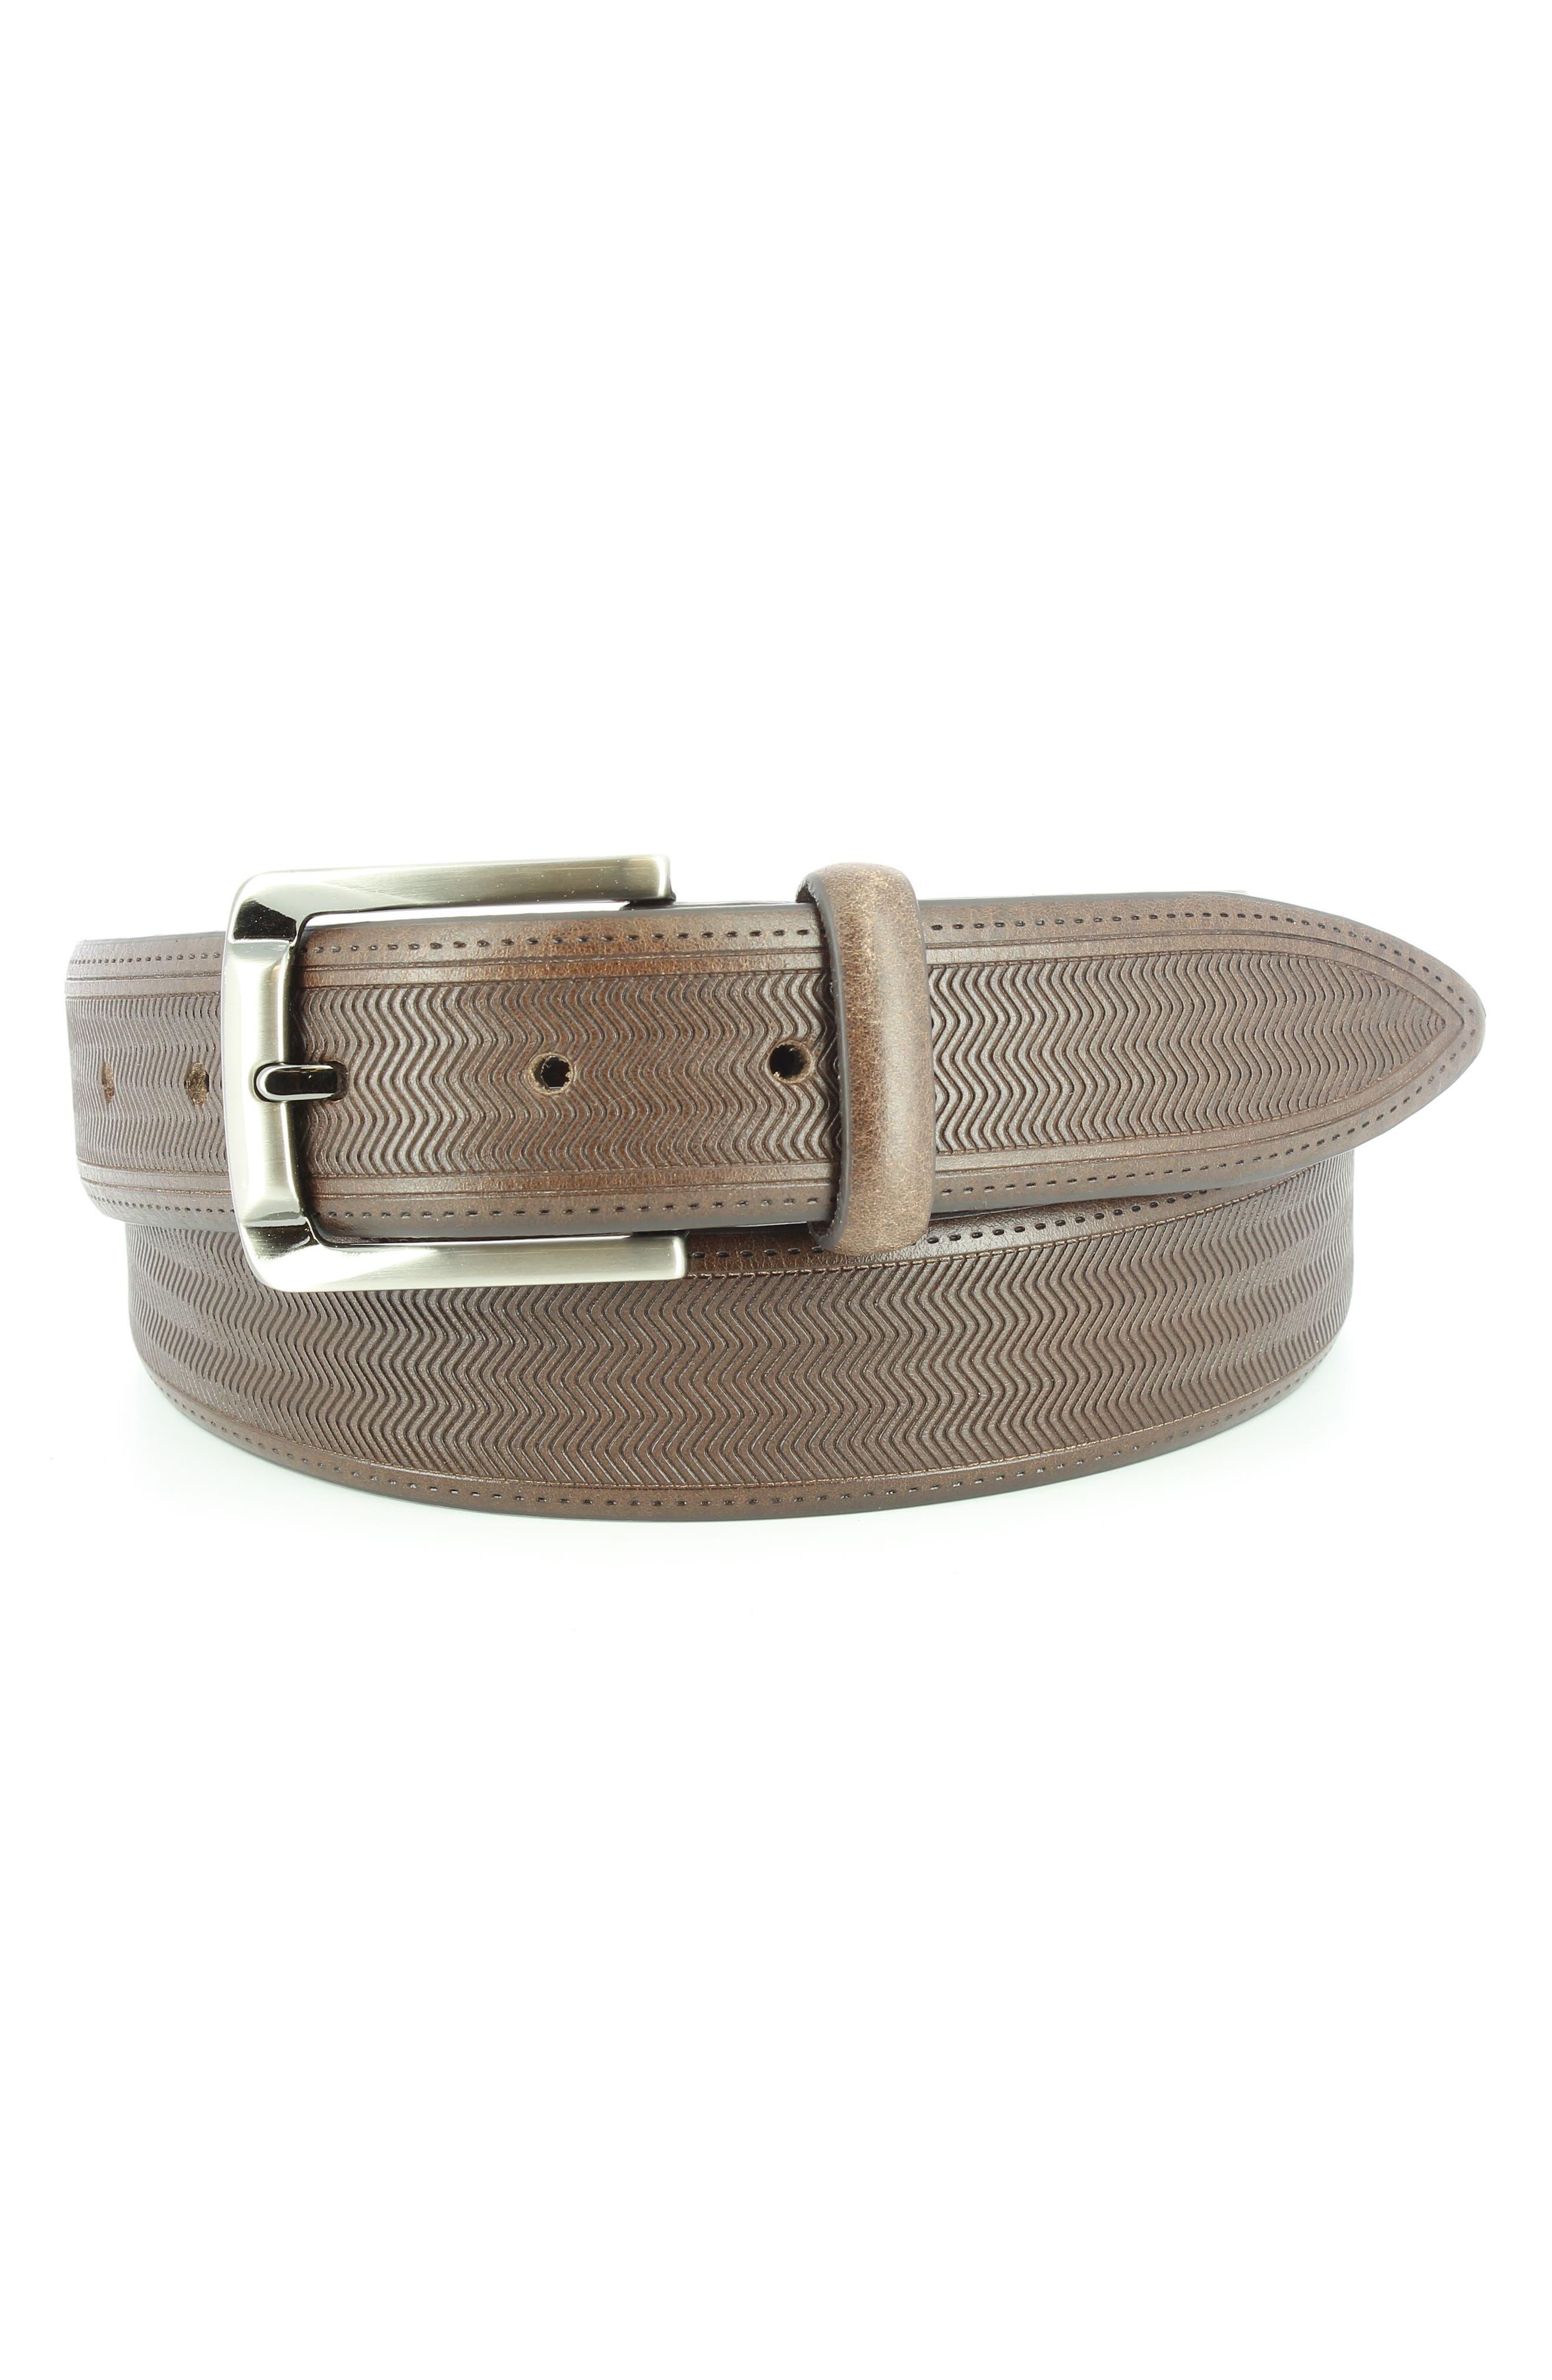 Raspail Leather Belt,                         Main,                         color, BROWN